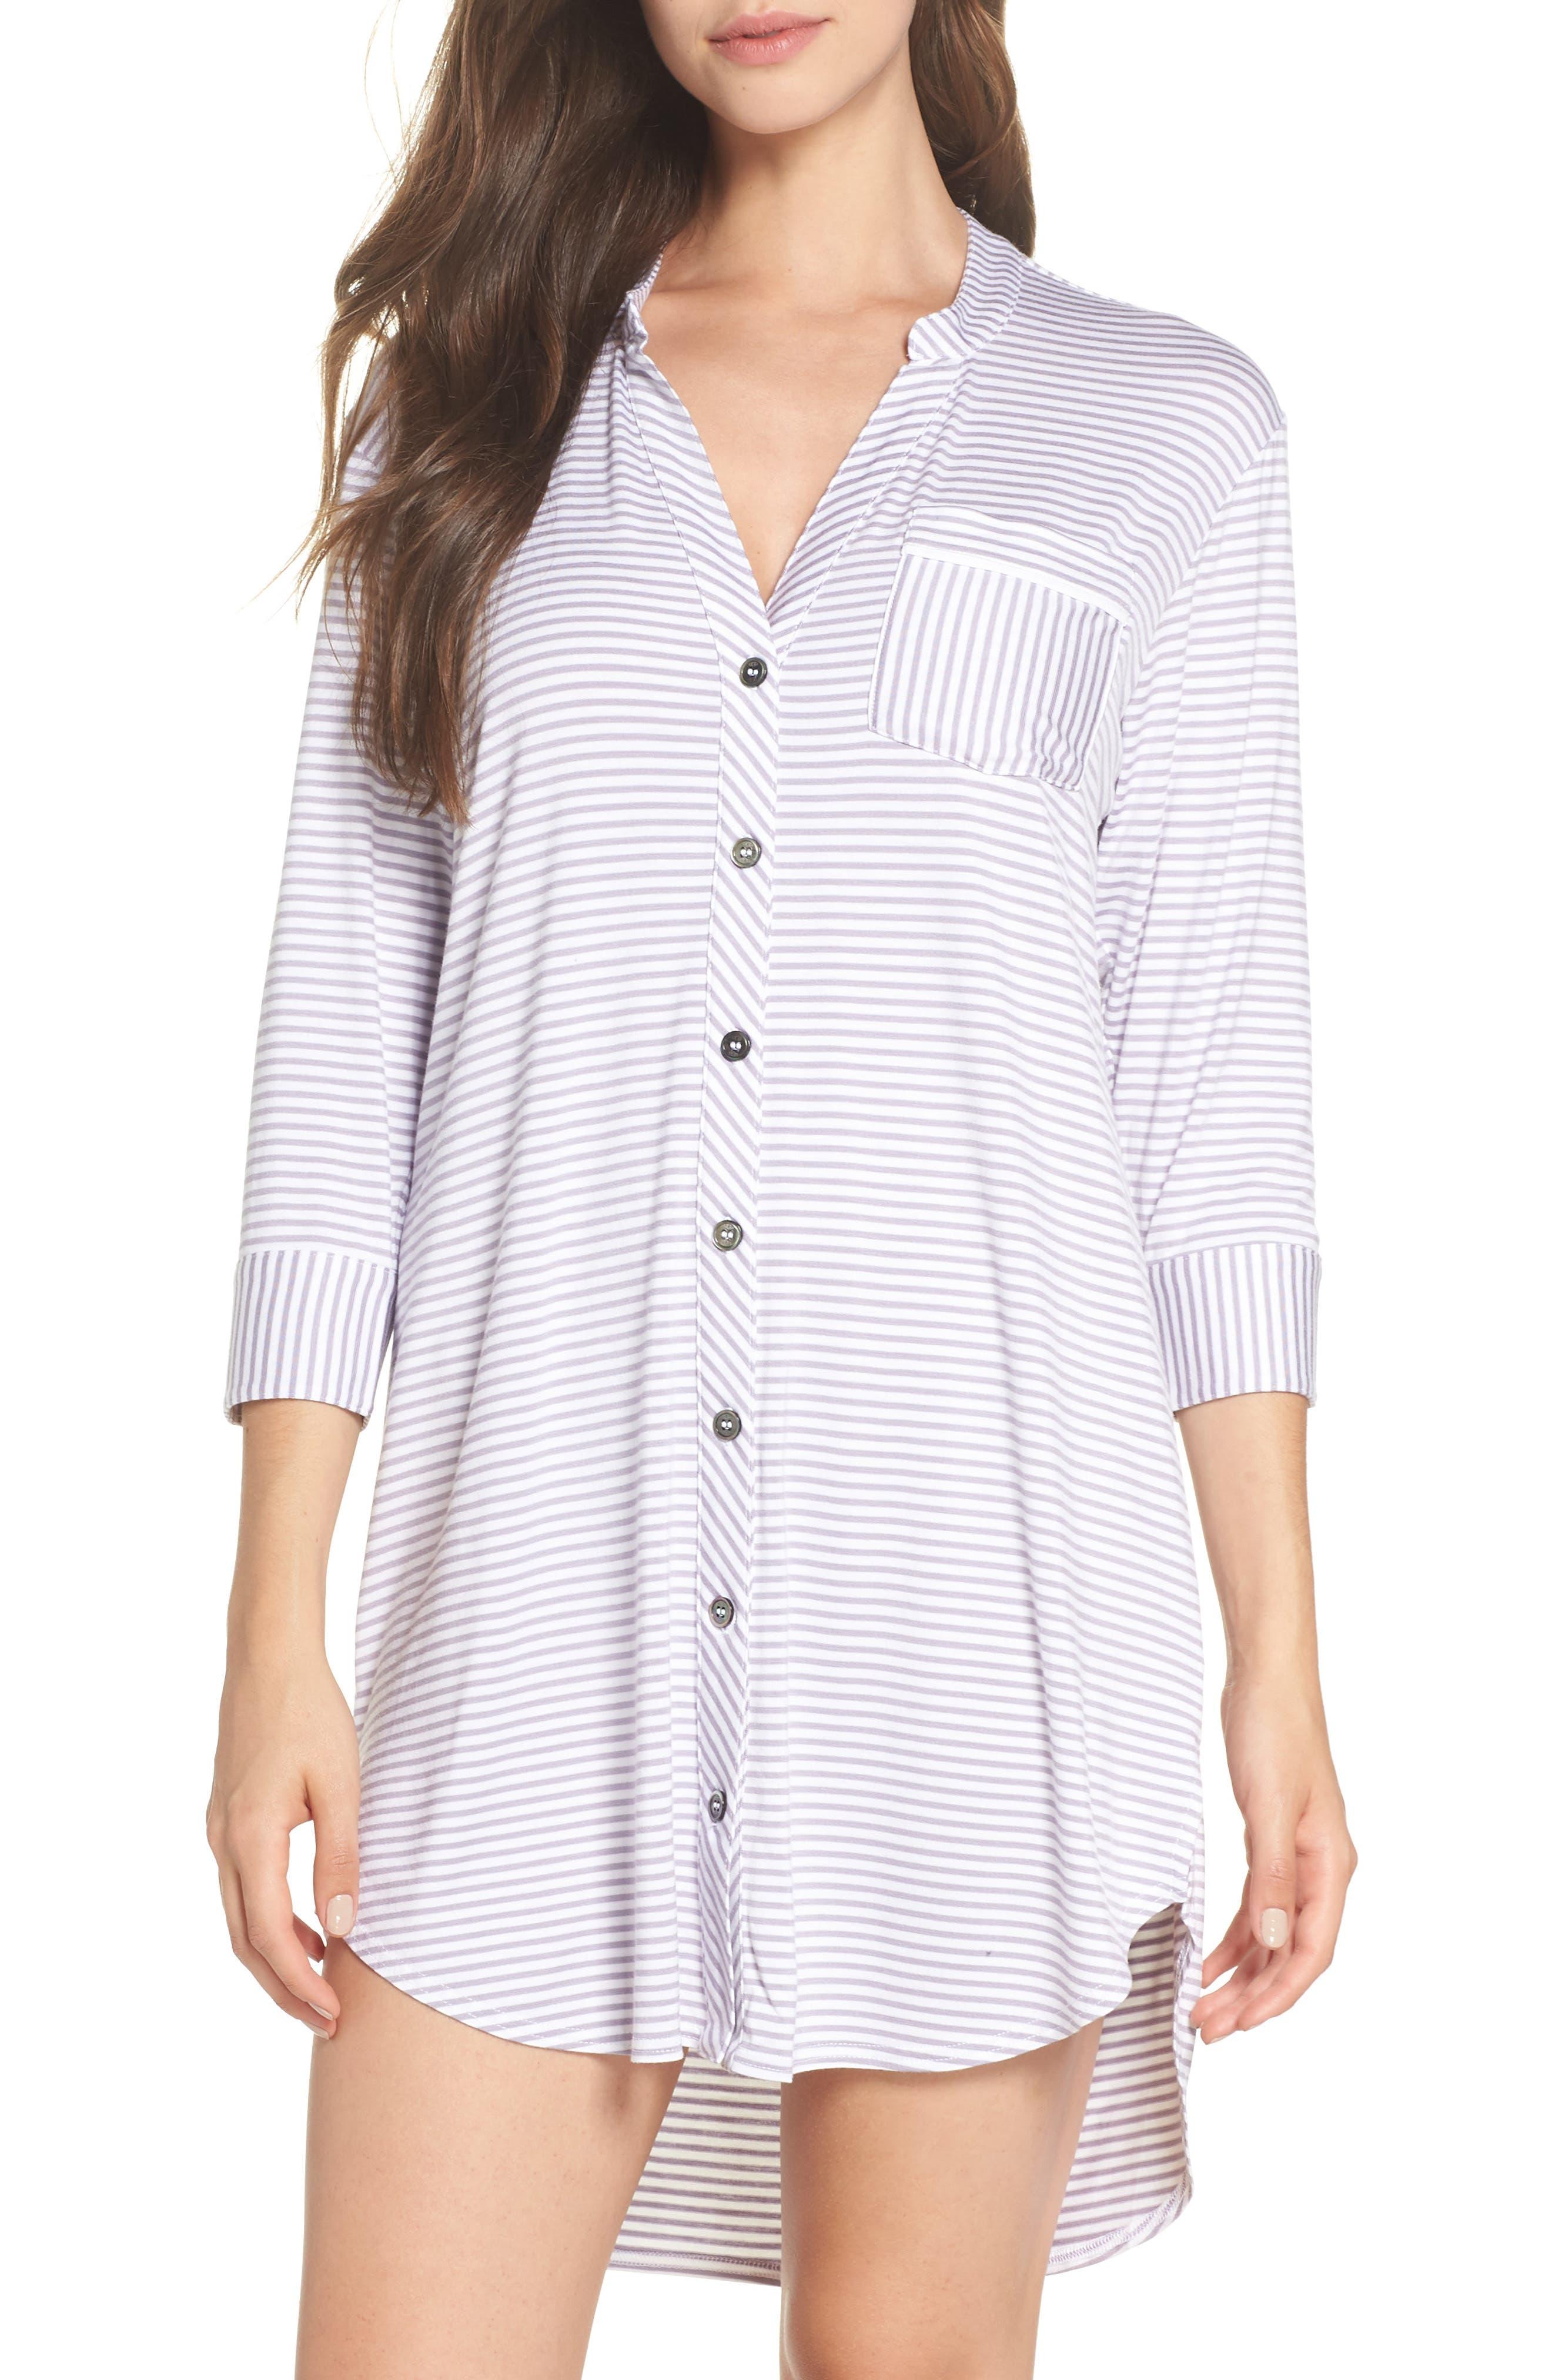 Vivian Sleep Shirt,                             Main thumbnail 1, color,                             LAVENDER AURA / WHITE STRIPE